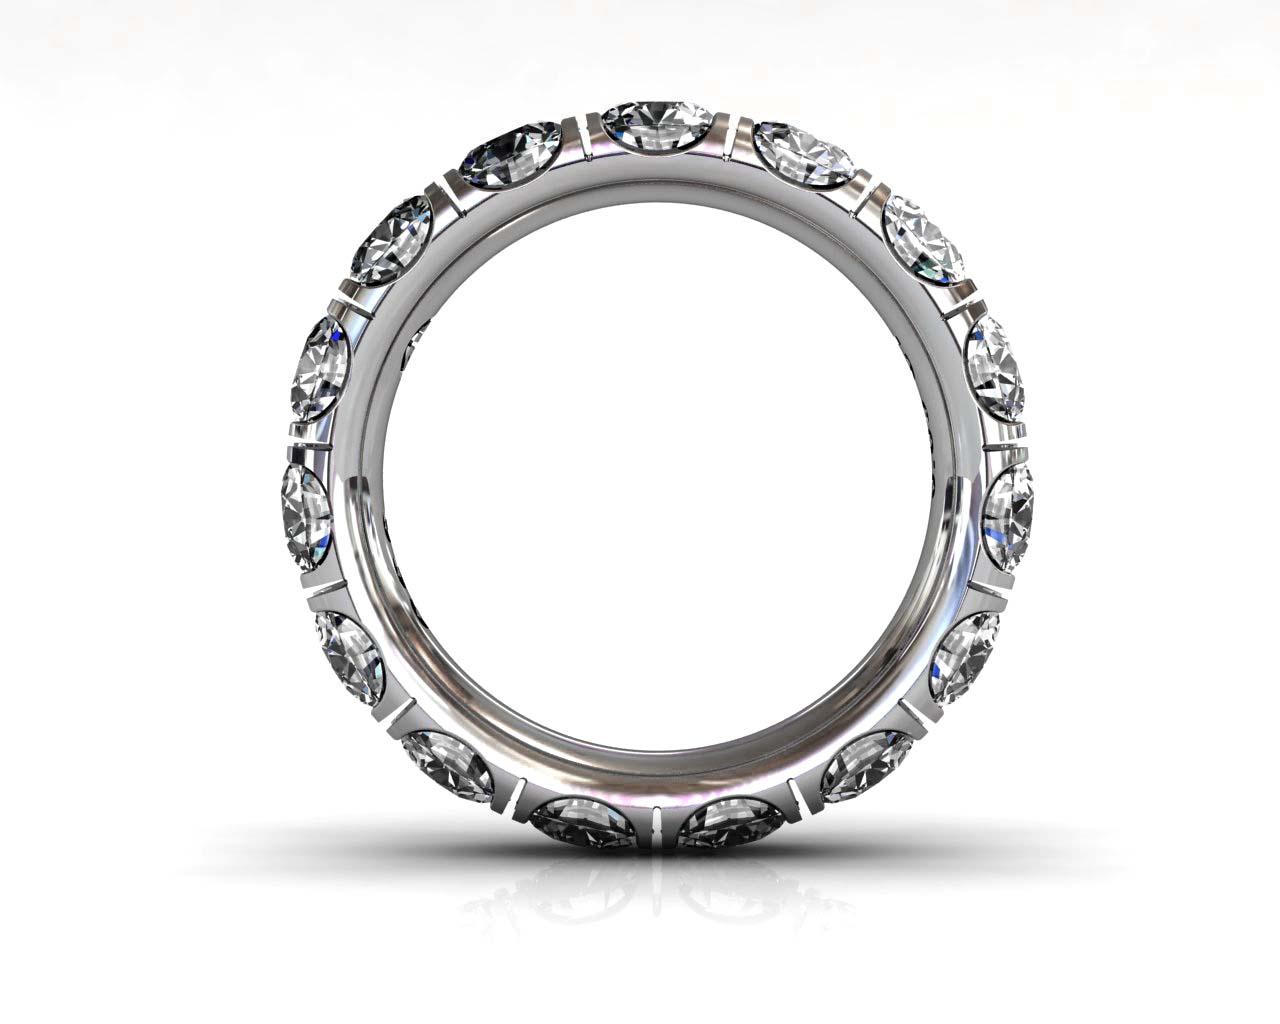 Wedding Bands Ladies Diamonds Craponia Setting 15 Stone 3.85 TCW Diamonds 4.60g 18kt White Gold